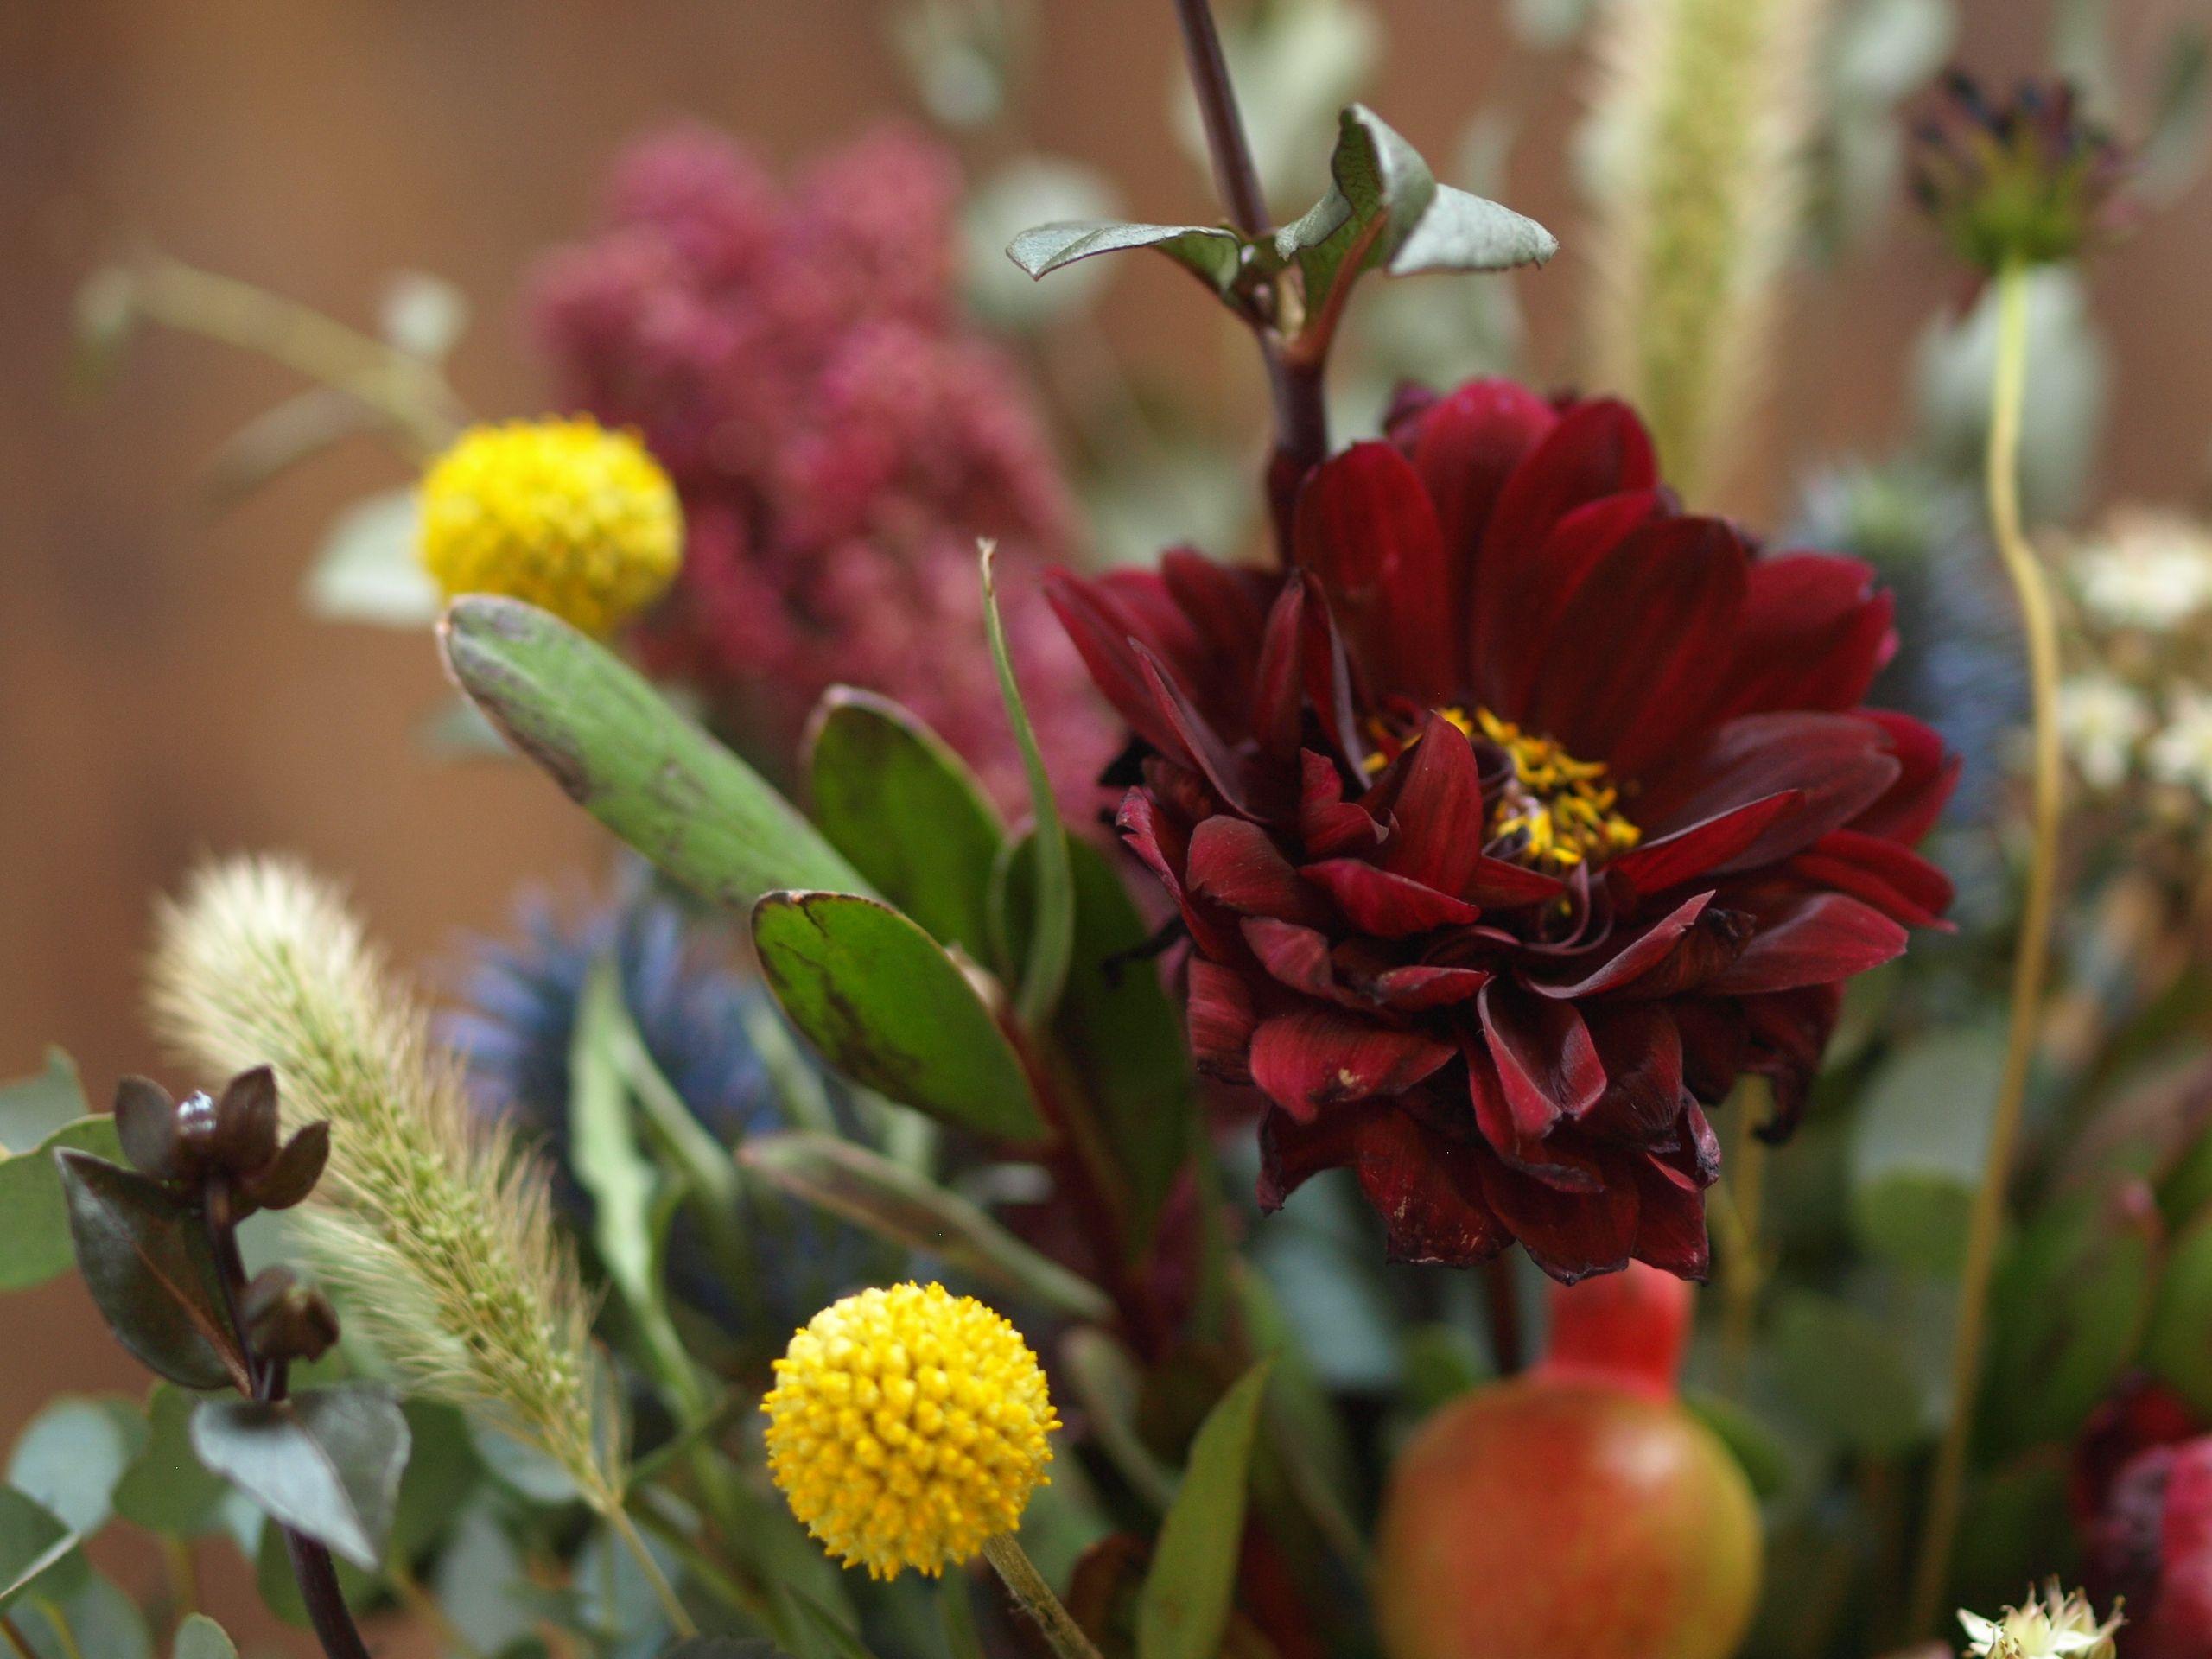 Centerpiece close up featuring burgundy dahlias yellow